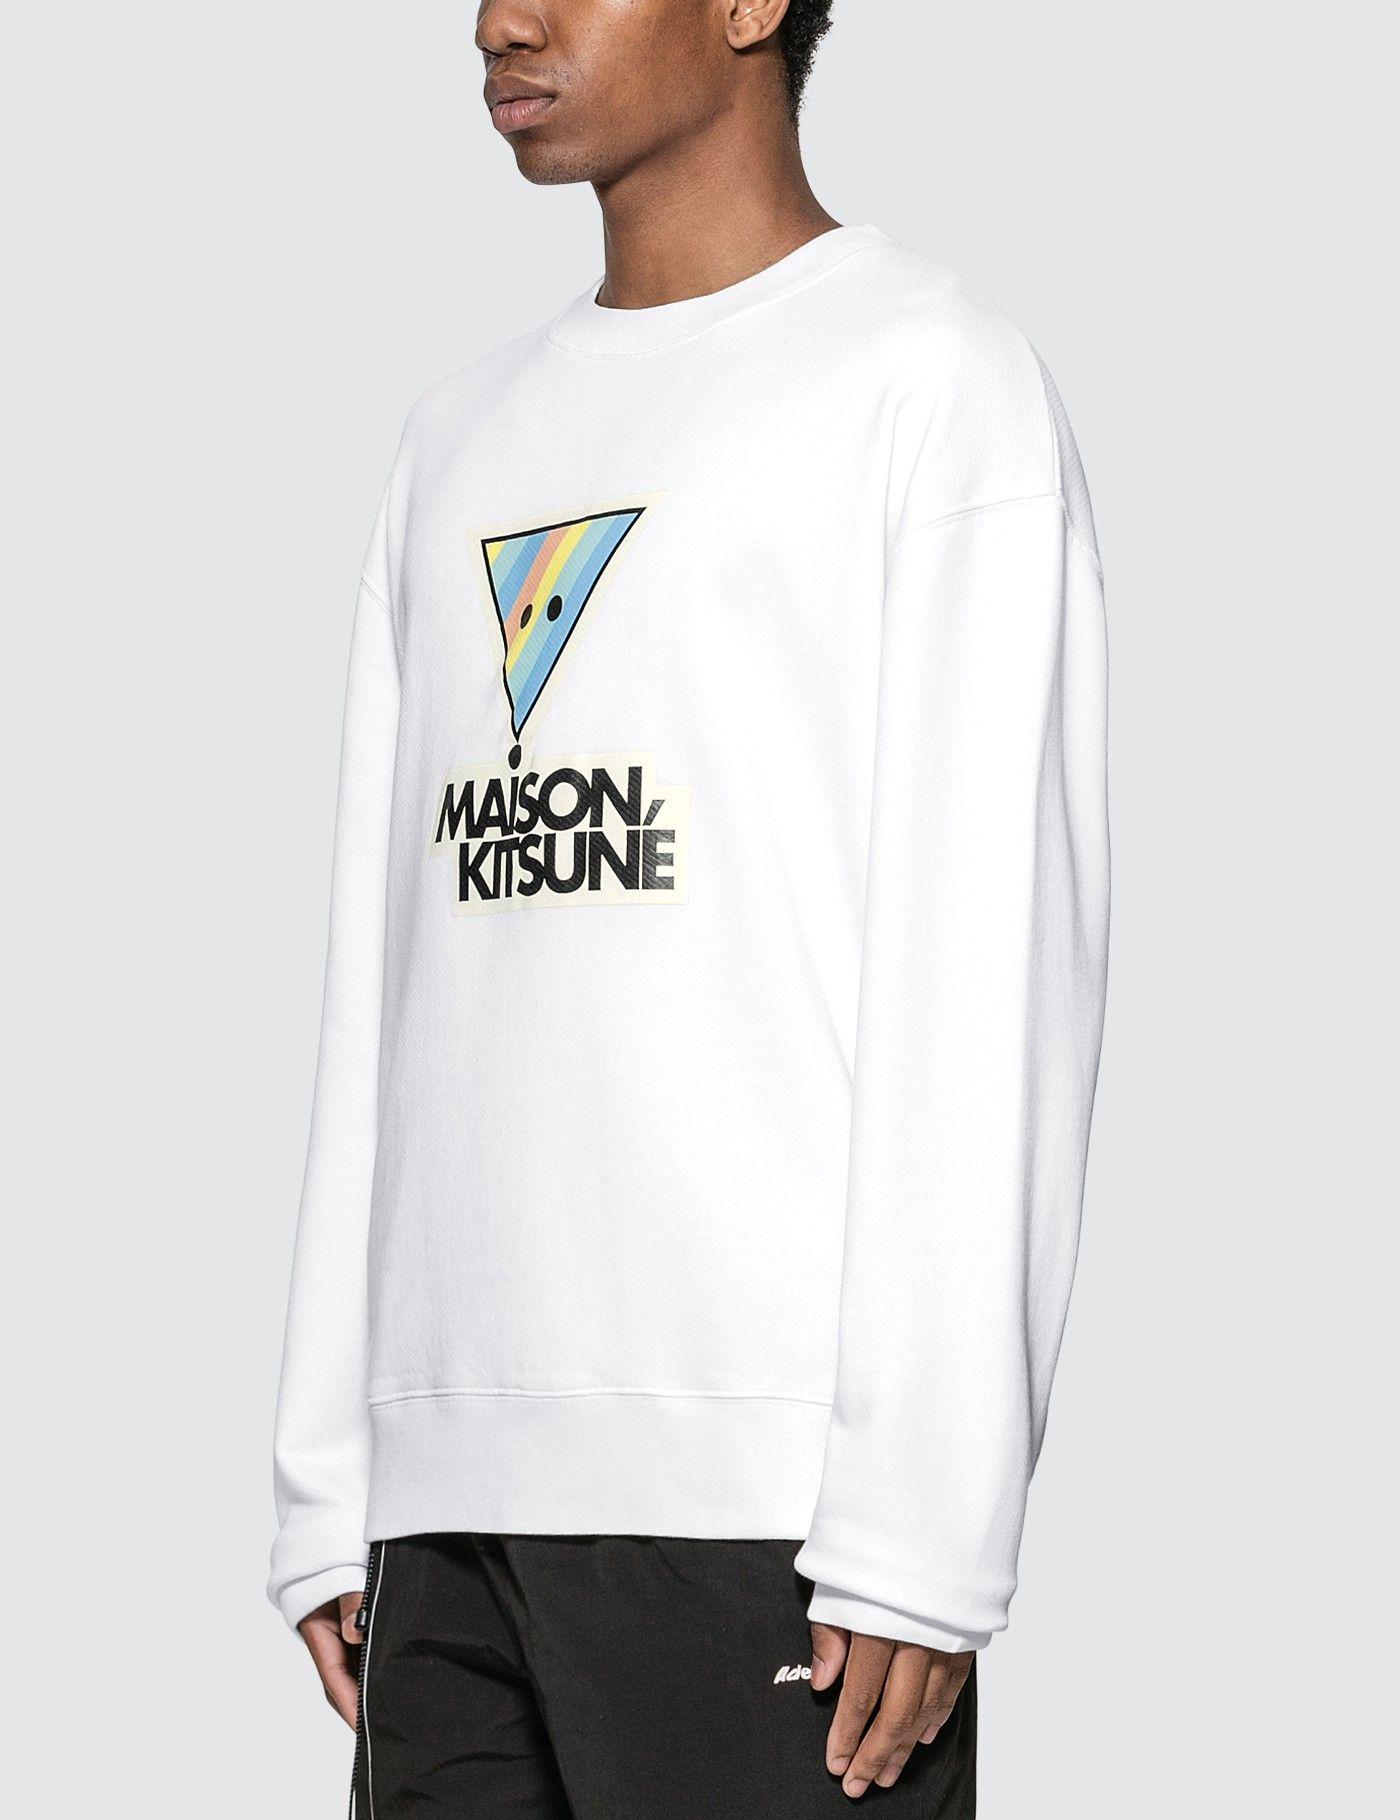 Maison Kitsune Rainbow Triangle Fox Print Sweatshirt Hbx Printed Sweatshirts Fox Print Long Sleeve Tshirt Men [ 1820 x 1400 Pixel ]